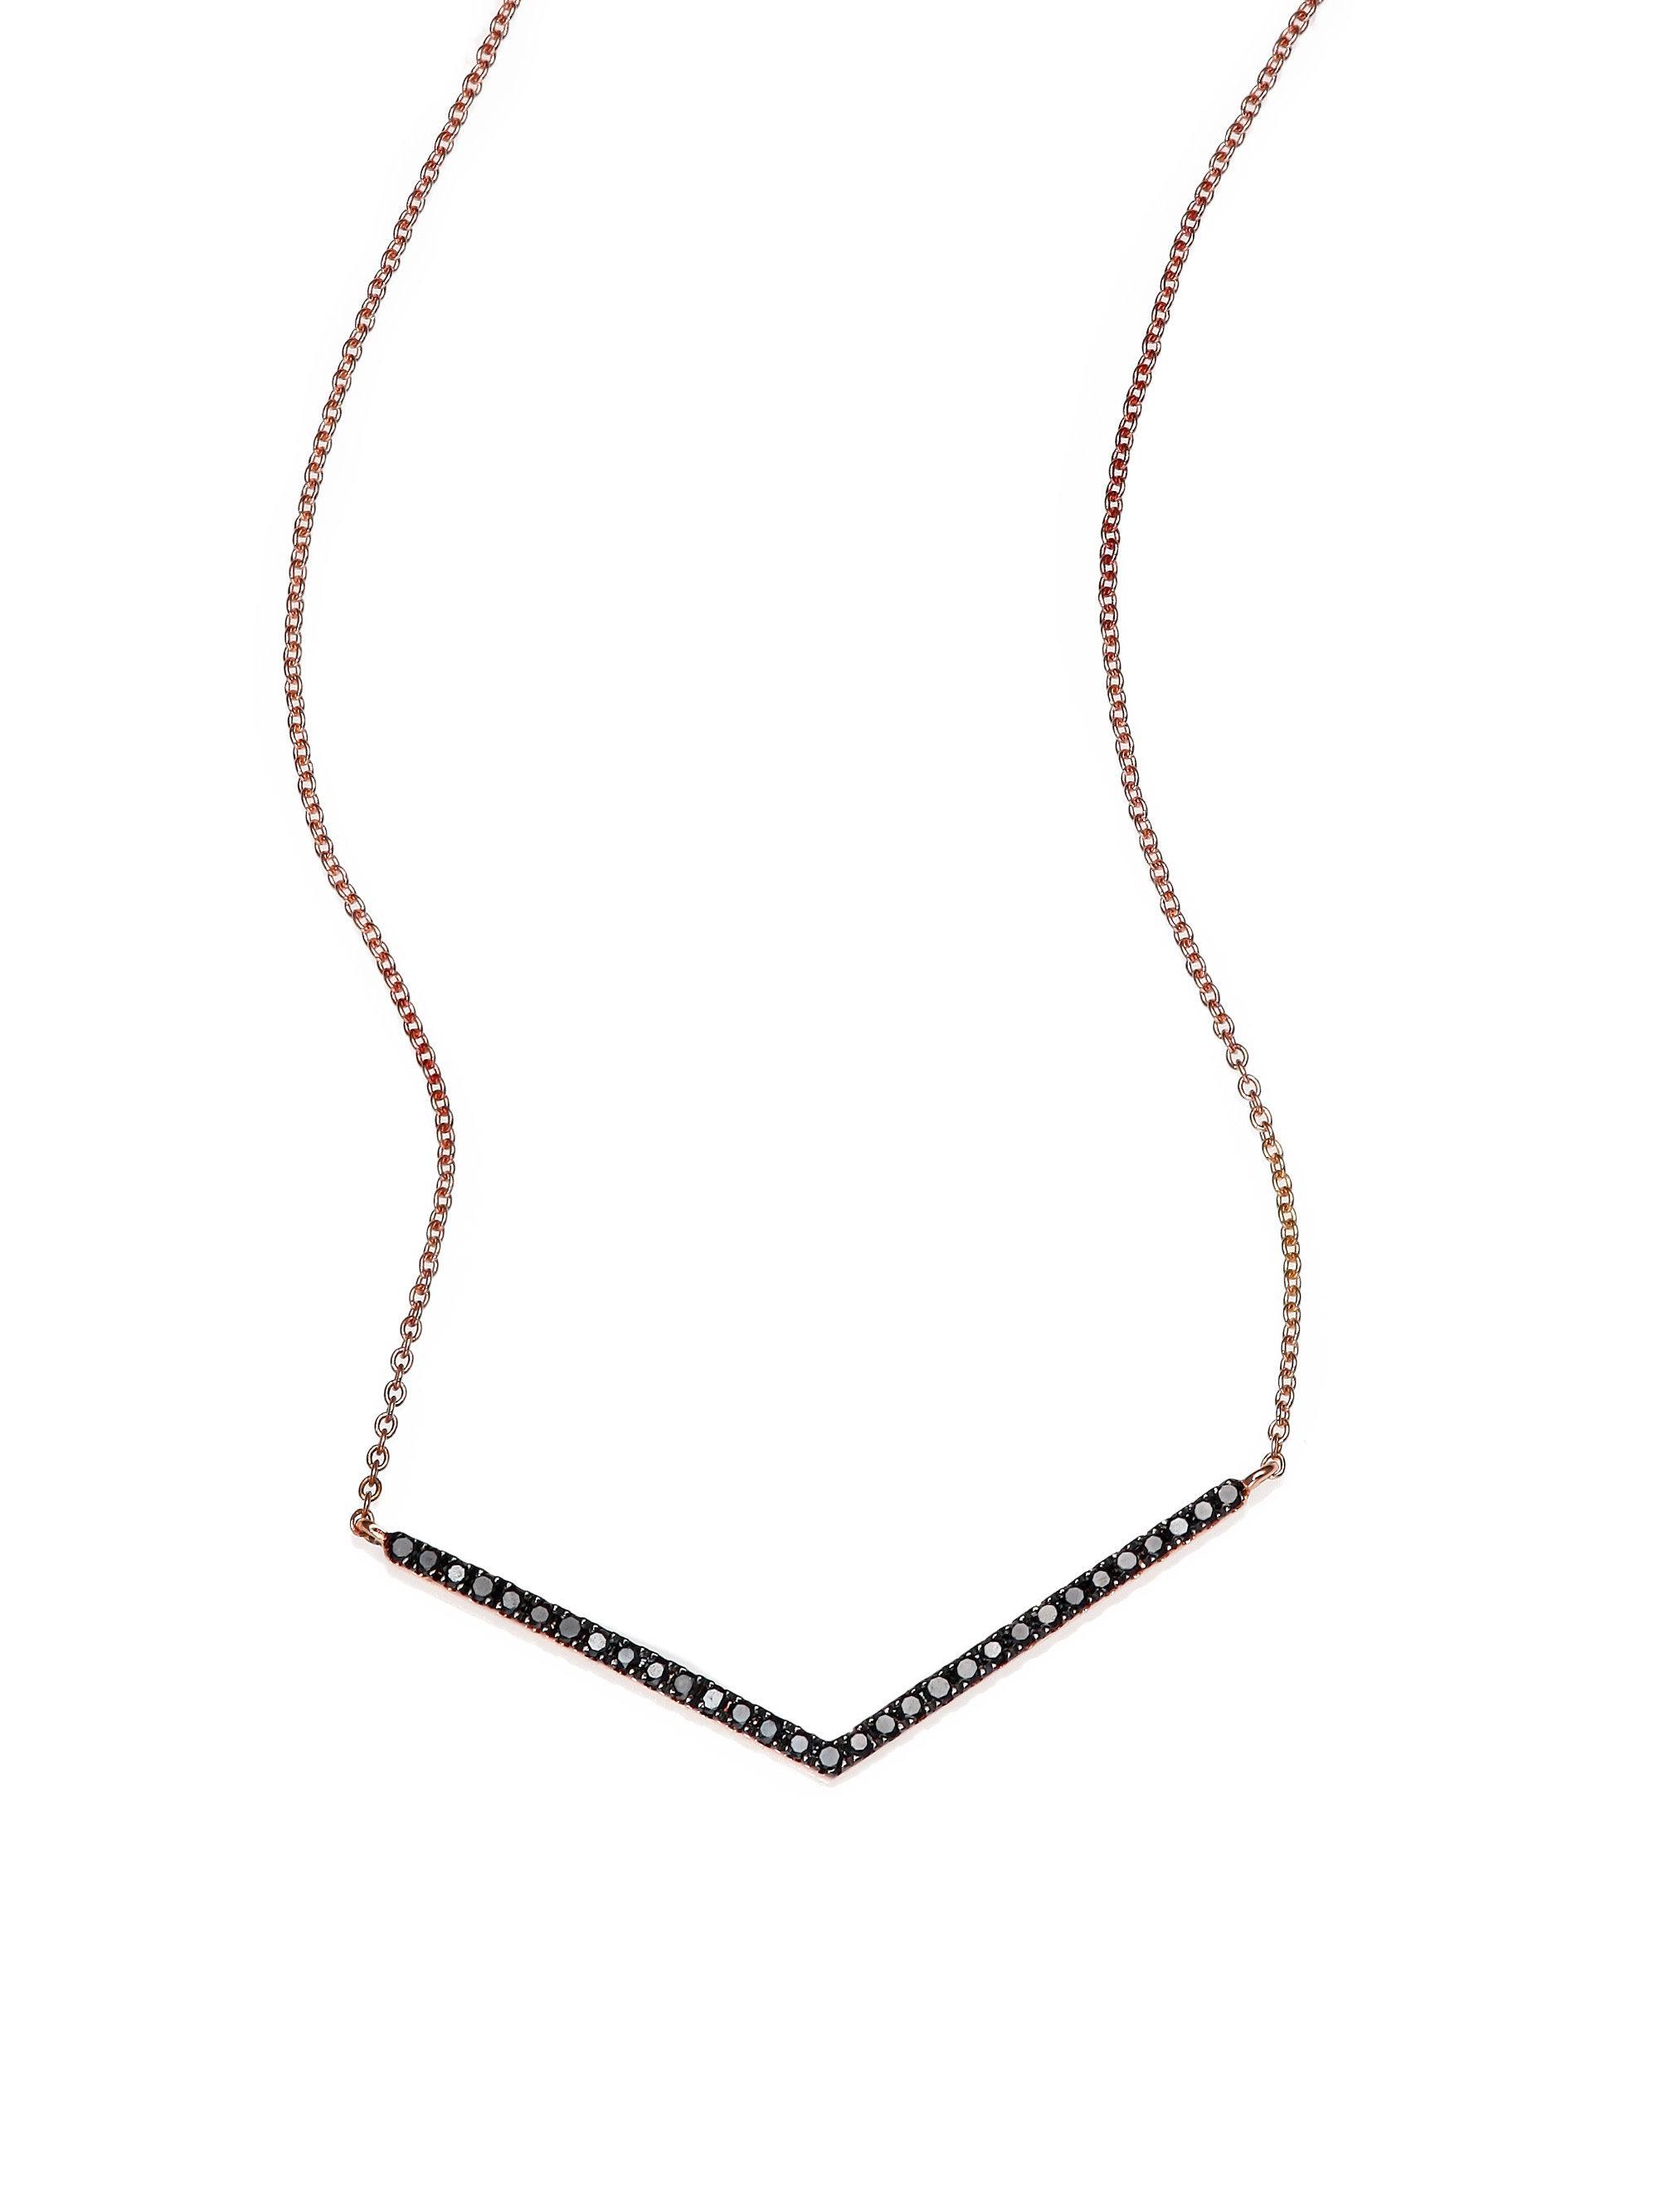 Diane Kordas Diamond & rose-gold Chevron necklace 7gRidT